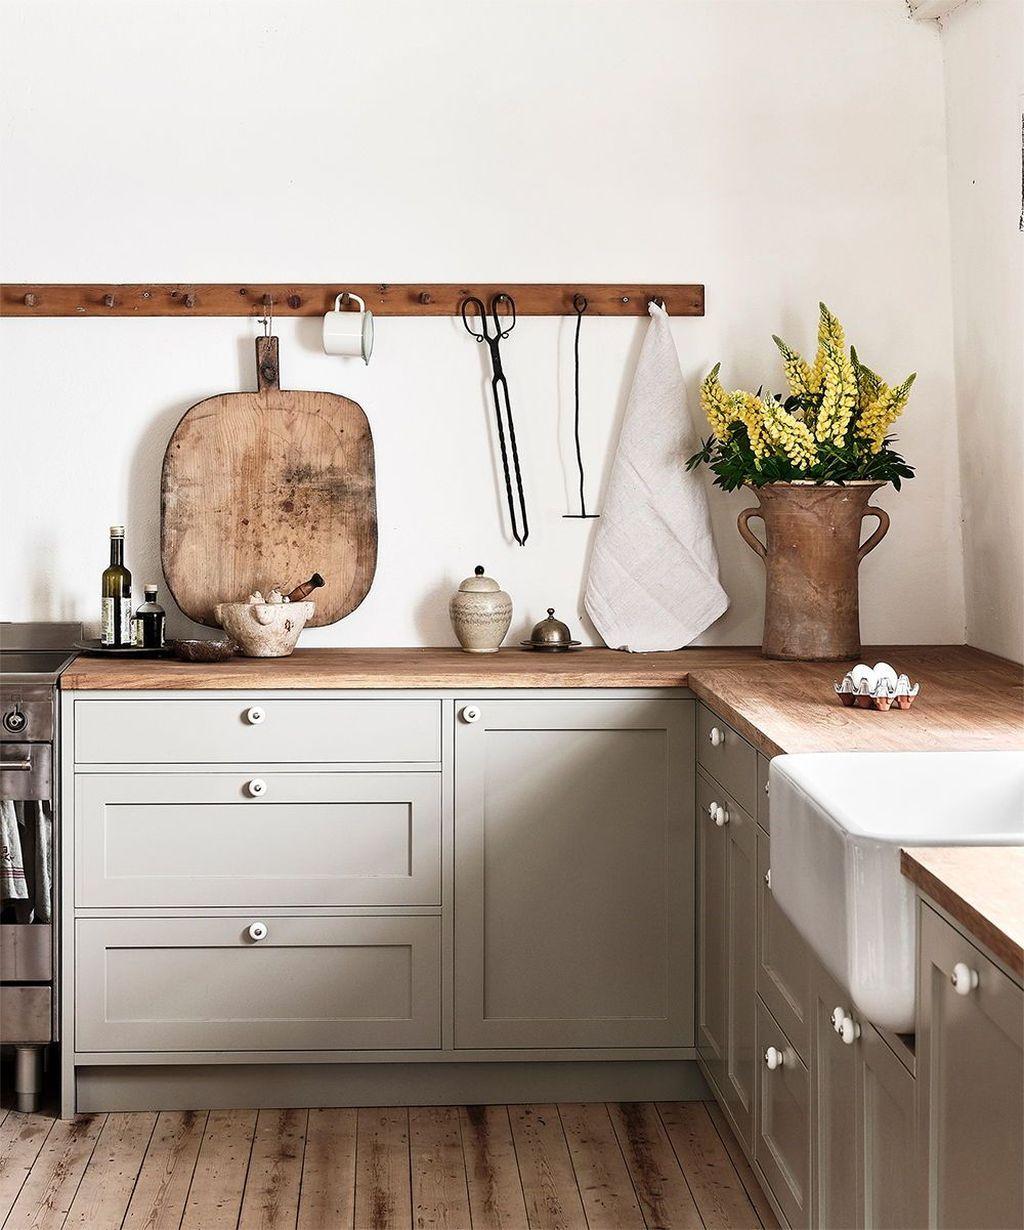 38 Amazing Scandinavian Kitchen Design Ideas With Island And Cabinets To Try Scandinavian Kitchen Design Farmhouse Kitchen Decor Scandinavian Kitchen